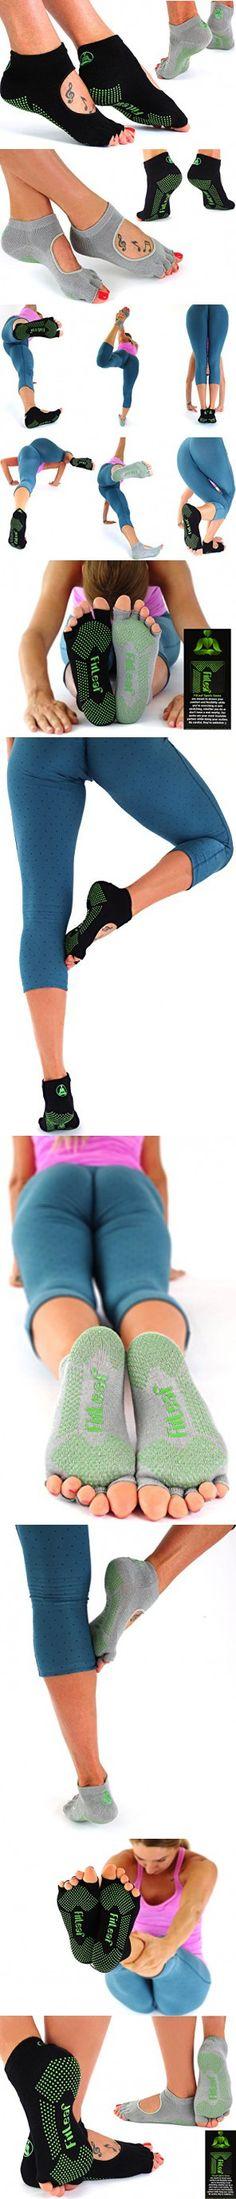 Fitleaf Yoga Bamboo Socks 2 Pairs Non Slip Grip For Pilates Barre